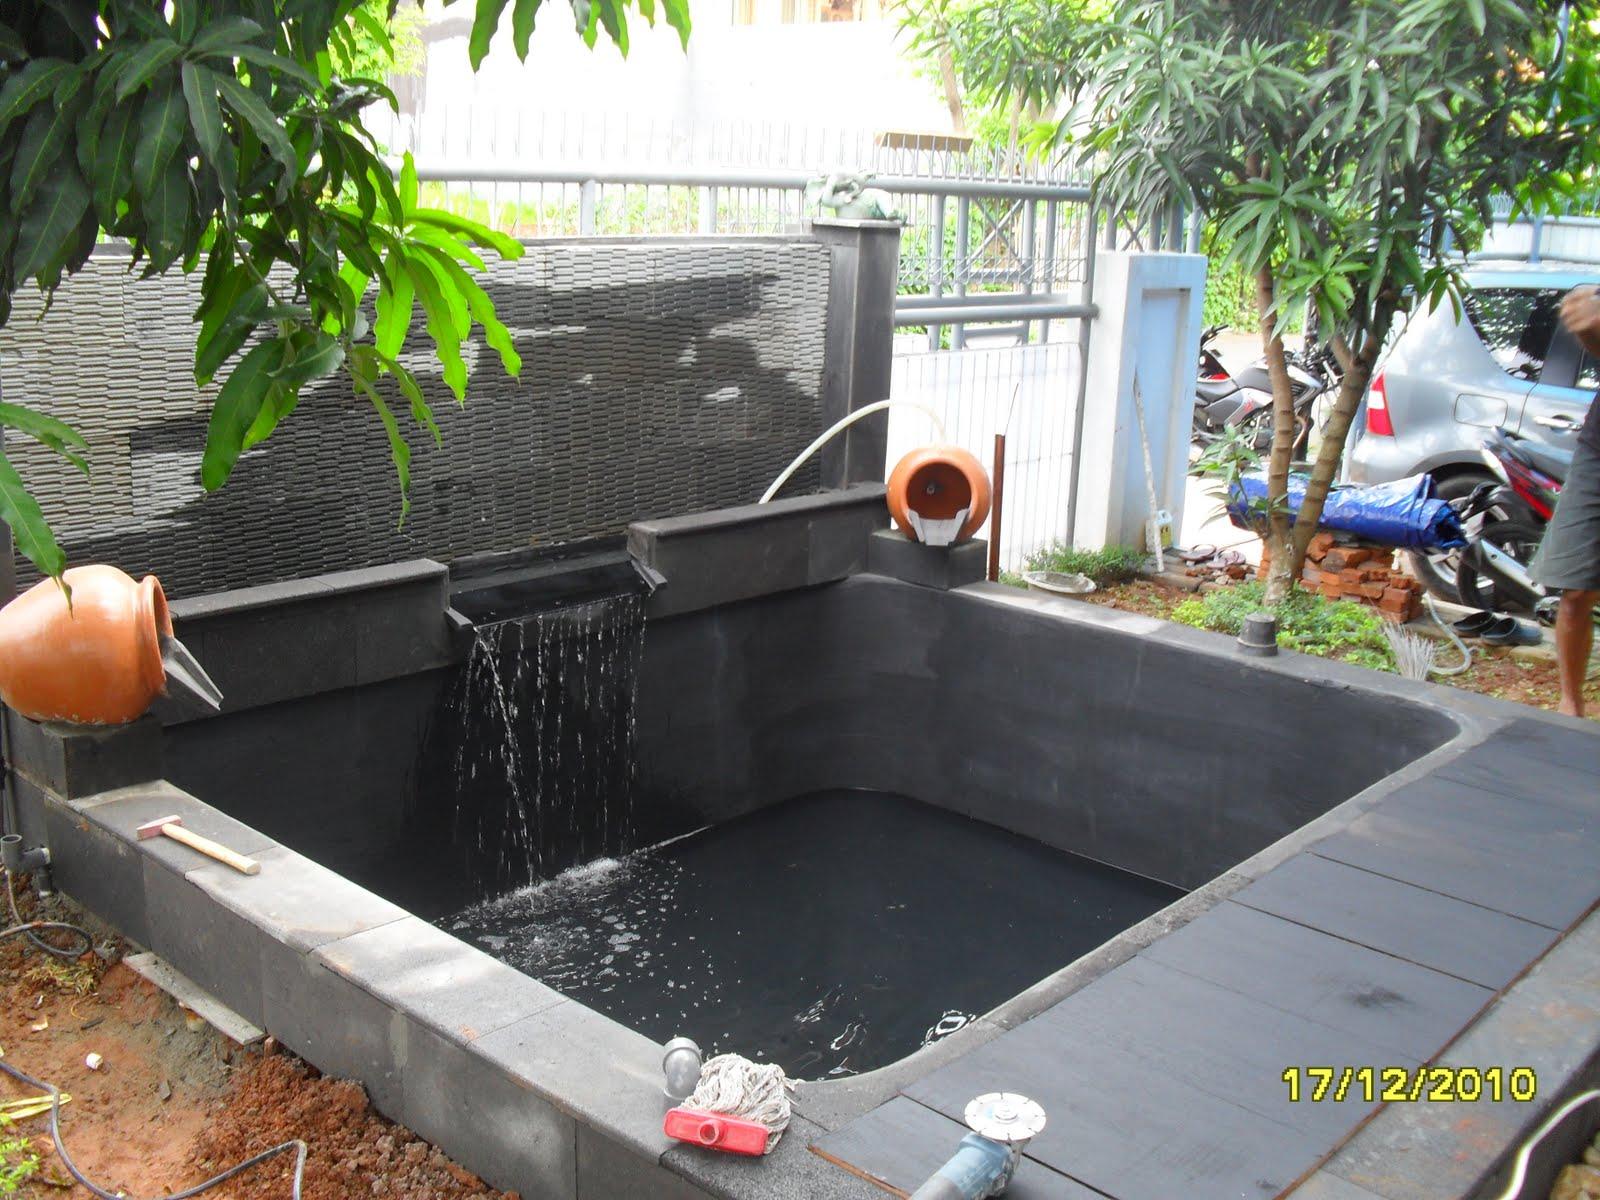 kolam hias kolam ikan koi kolam minimaliskolam relief